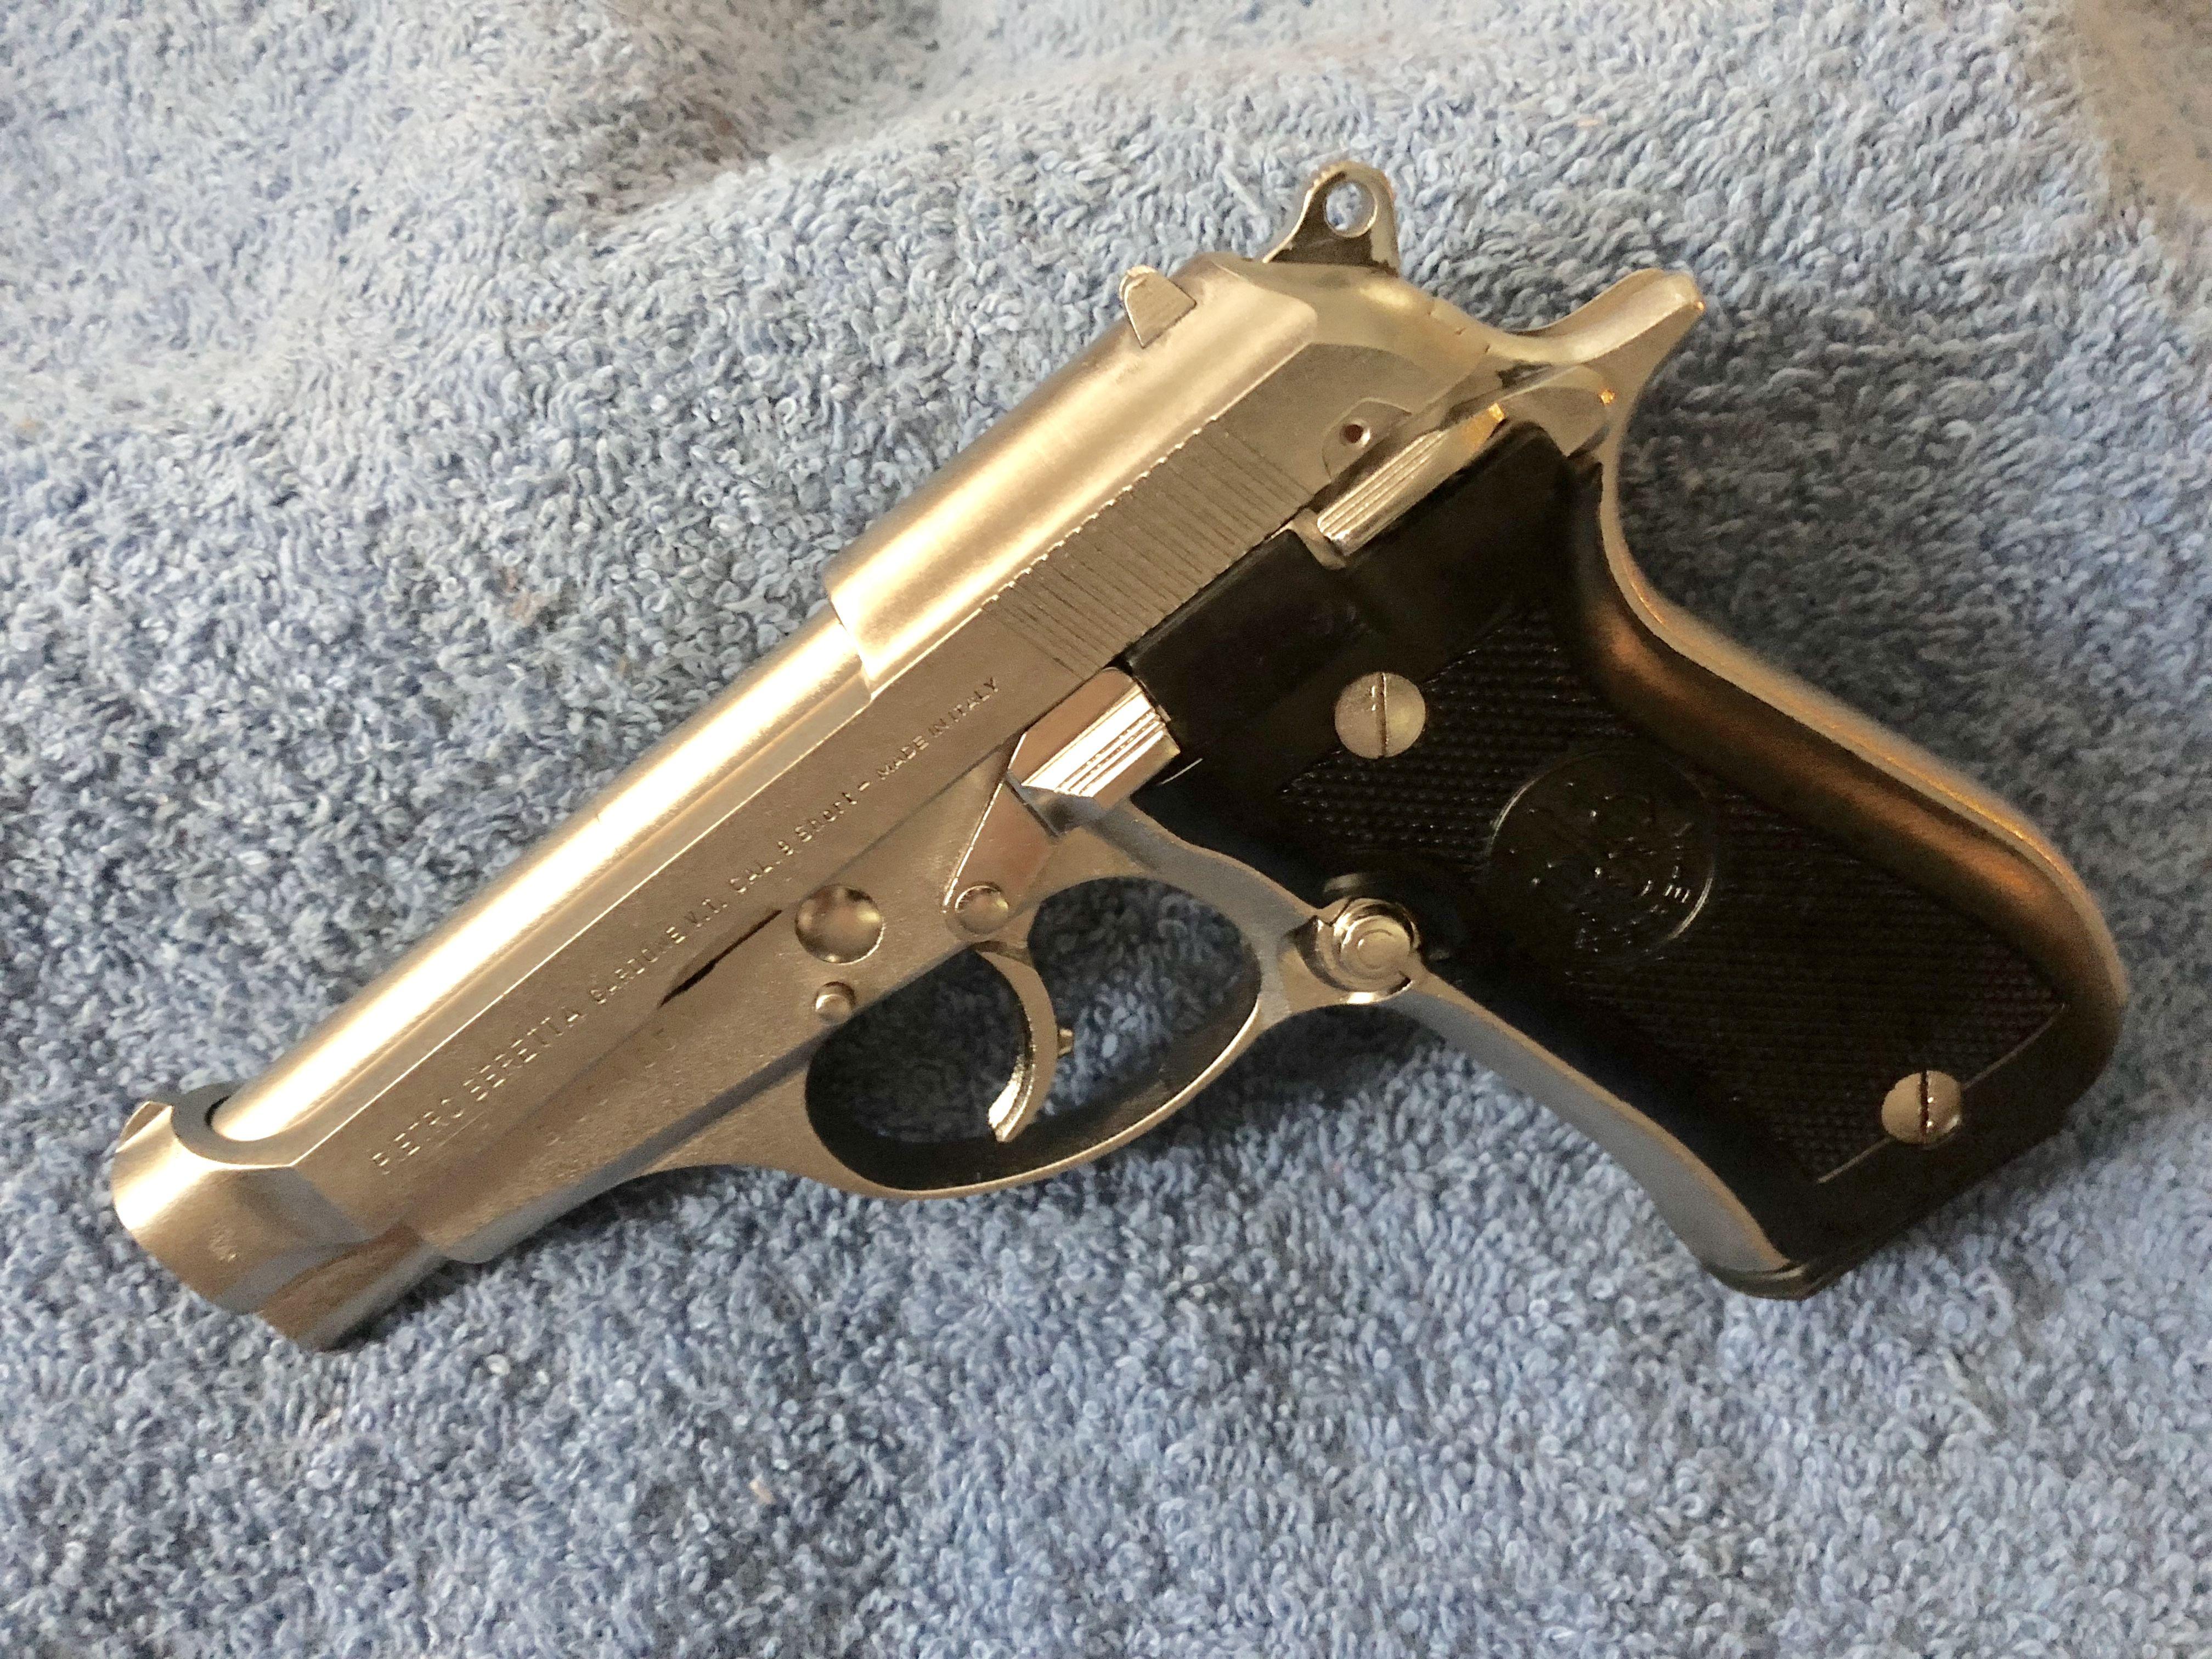 My Beretta 84 Cheetah After Nickel Plating | Guns | Guns